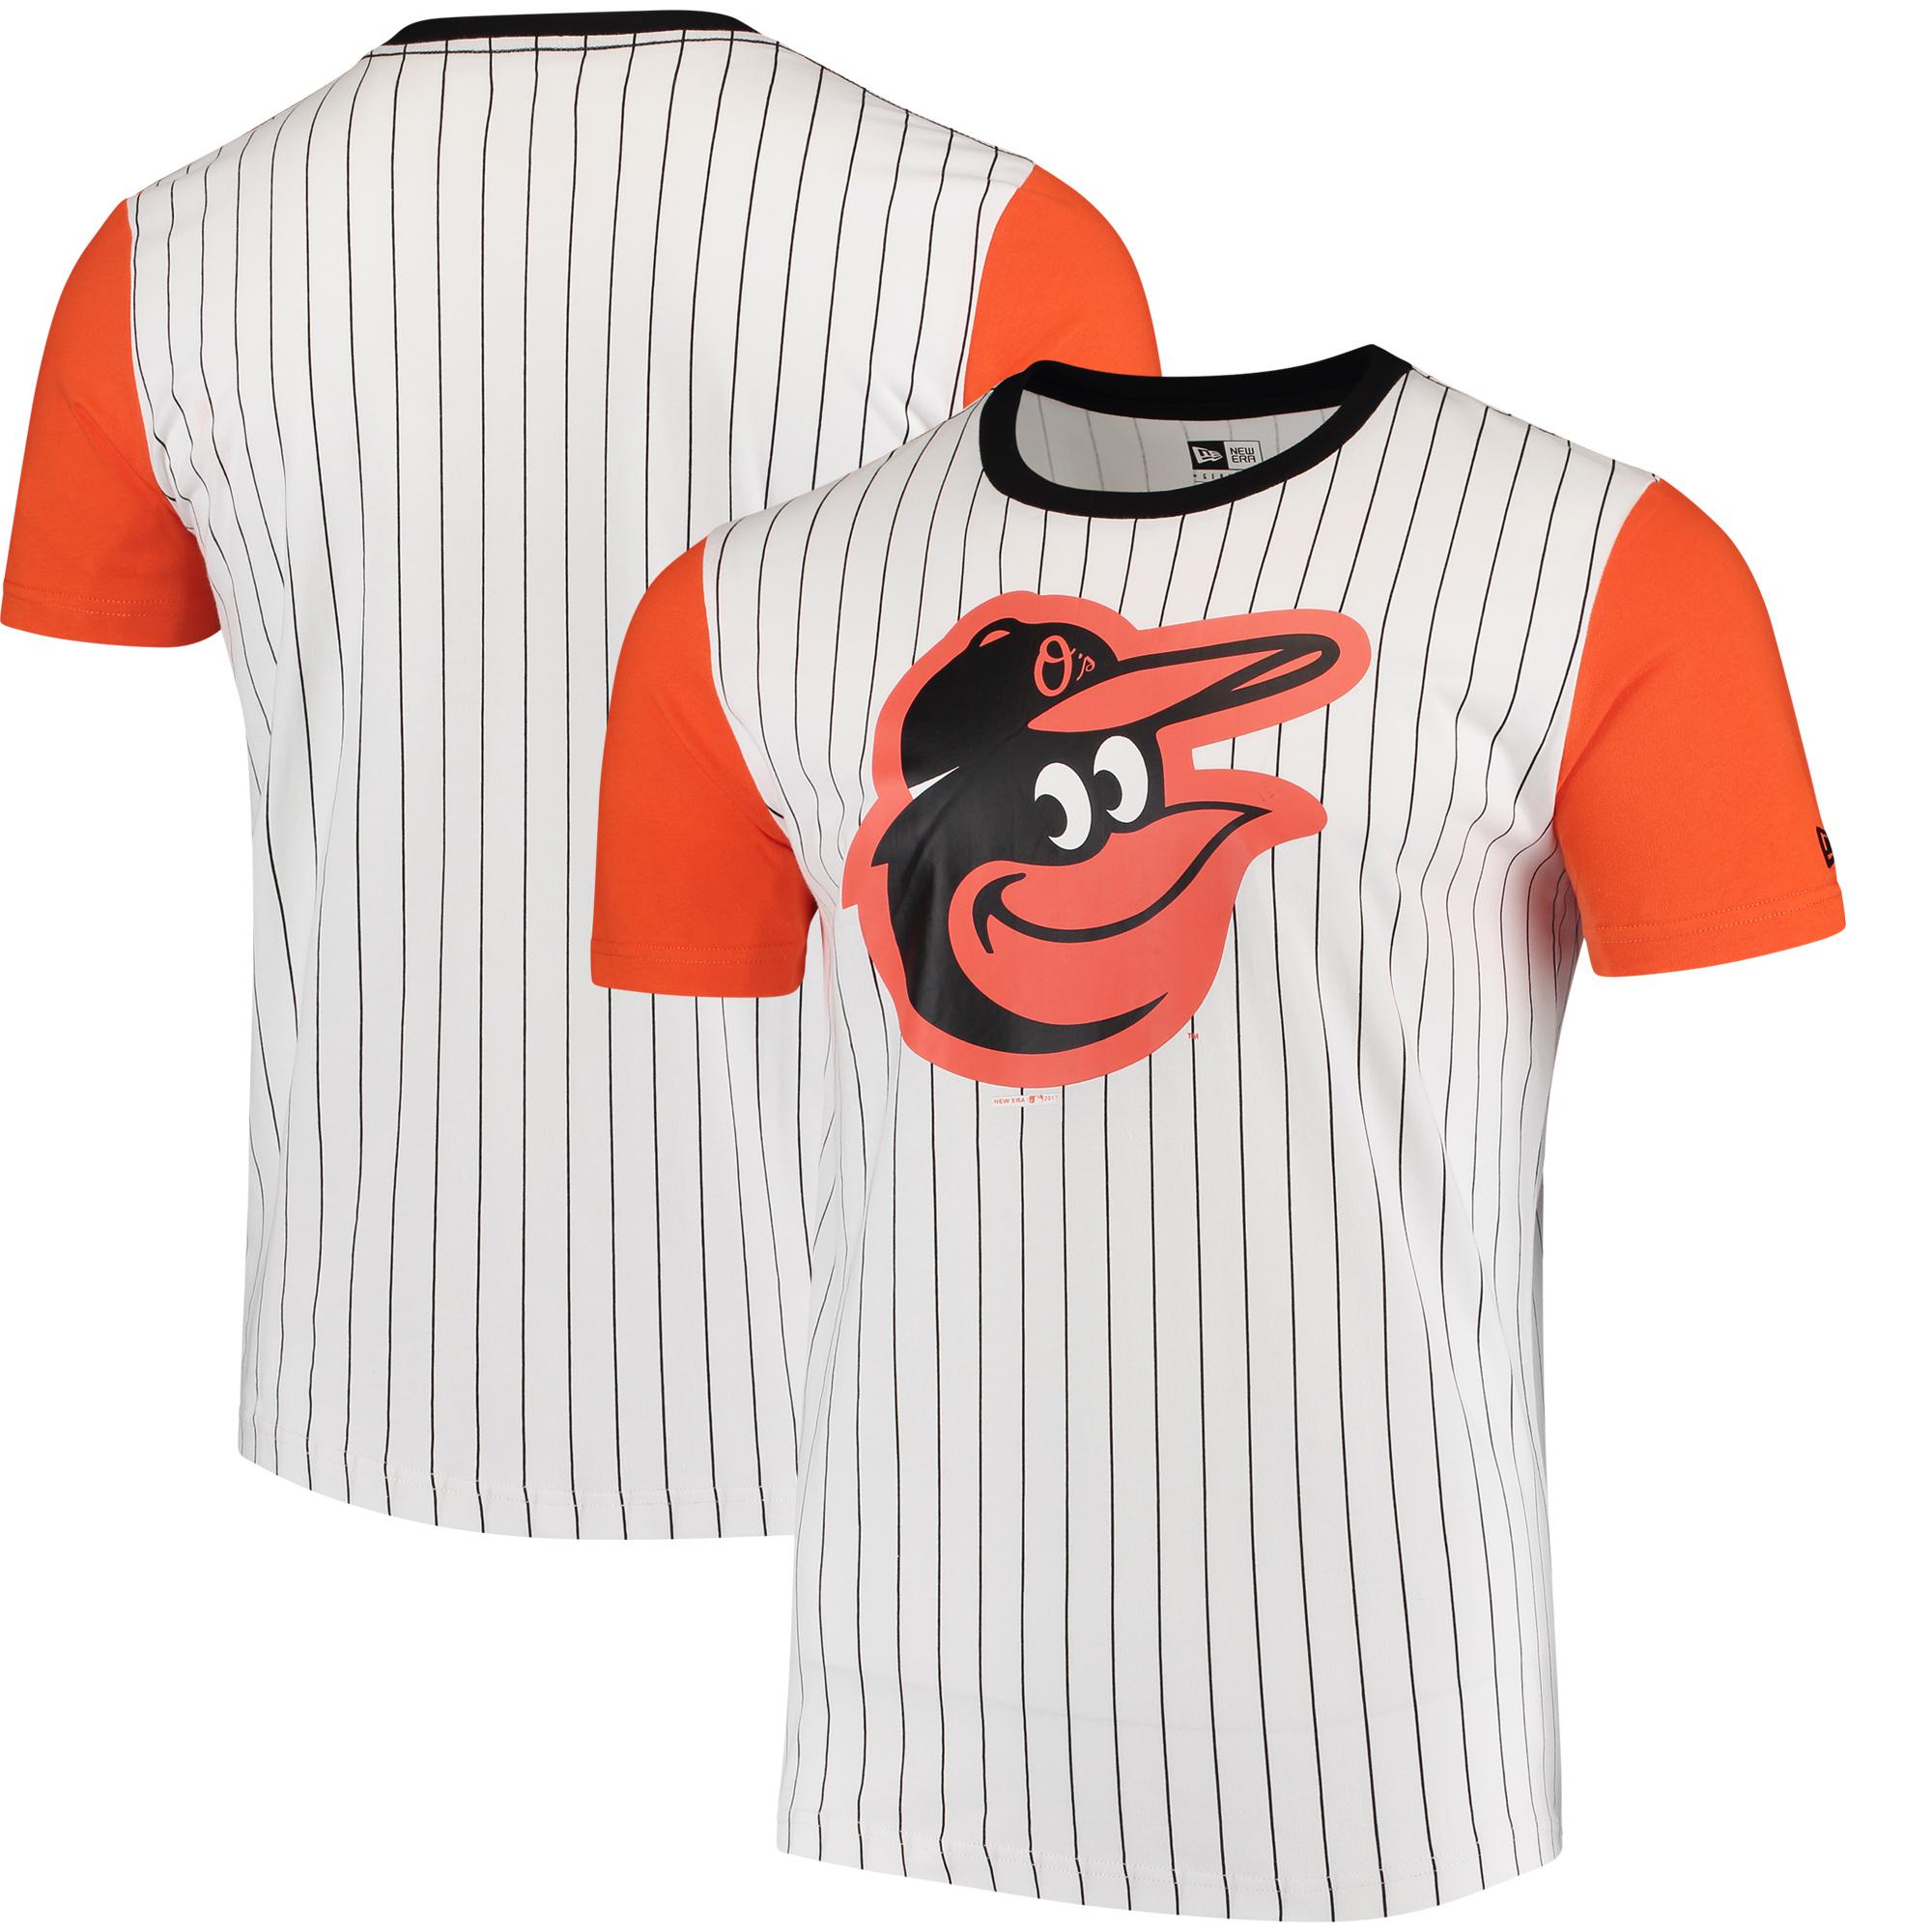 Baltimore Orioles New Era Pinstripe Baseball T-Shirt - White/Orange